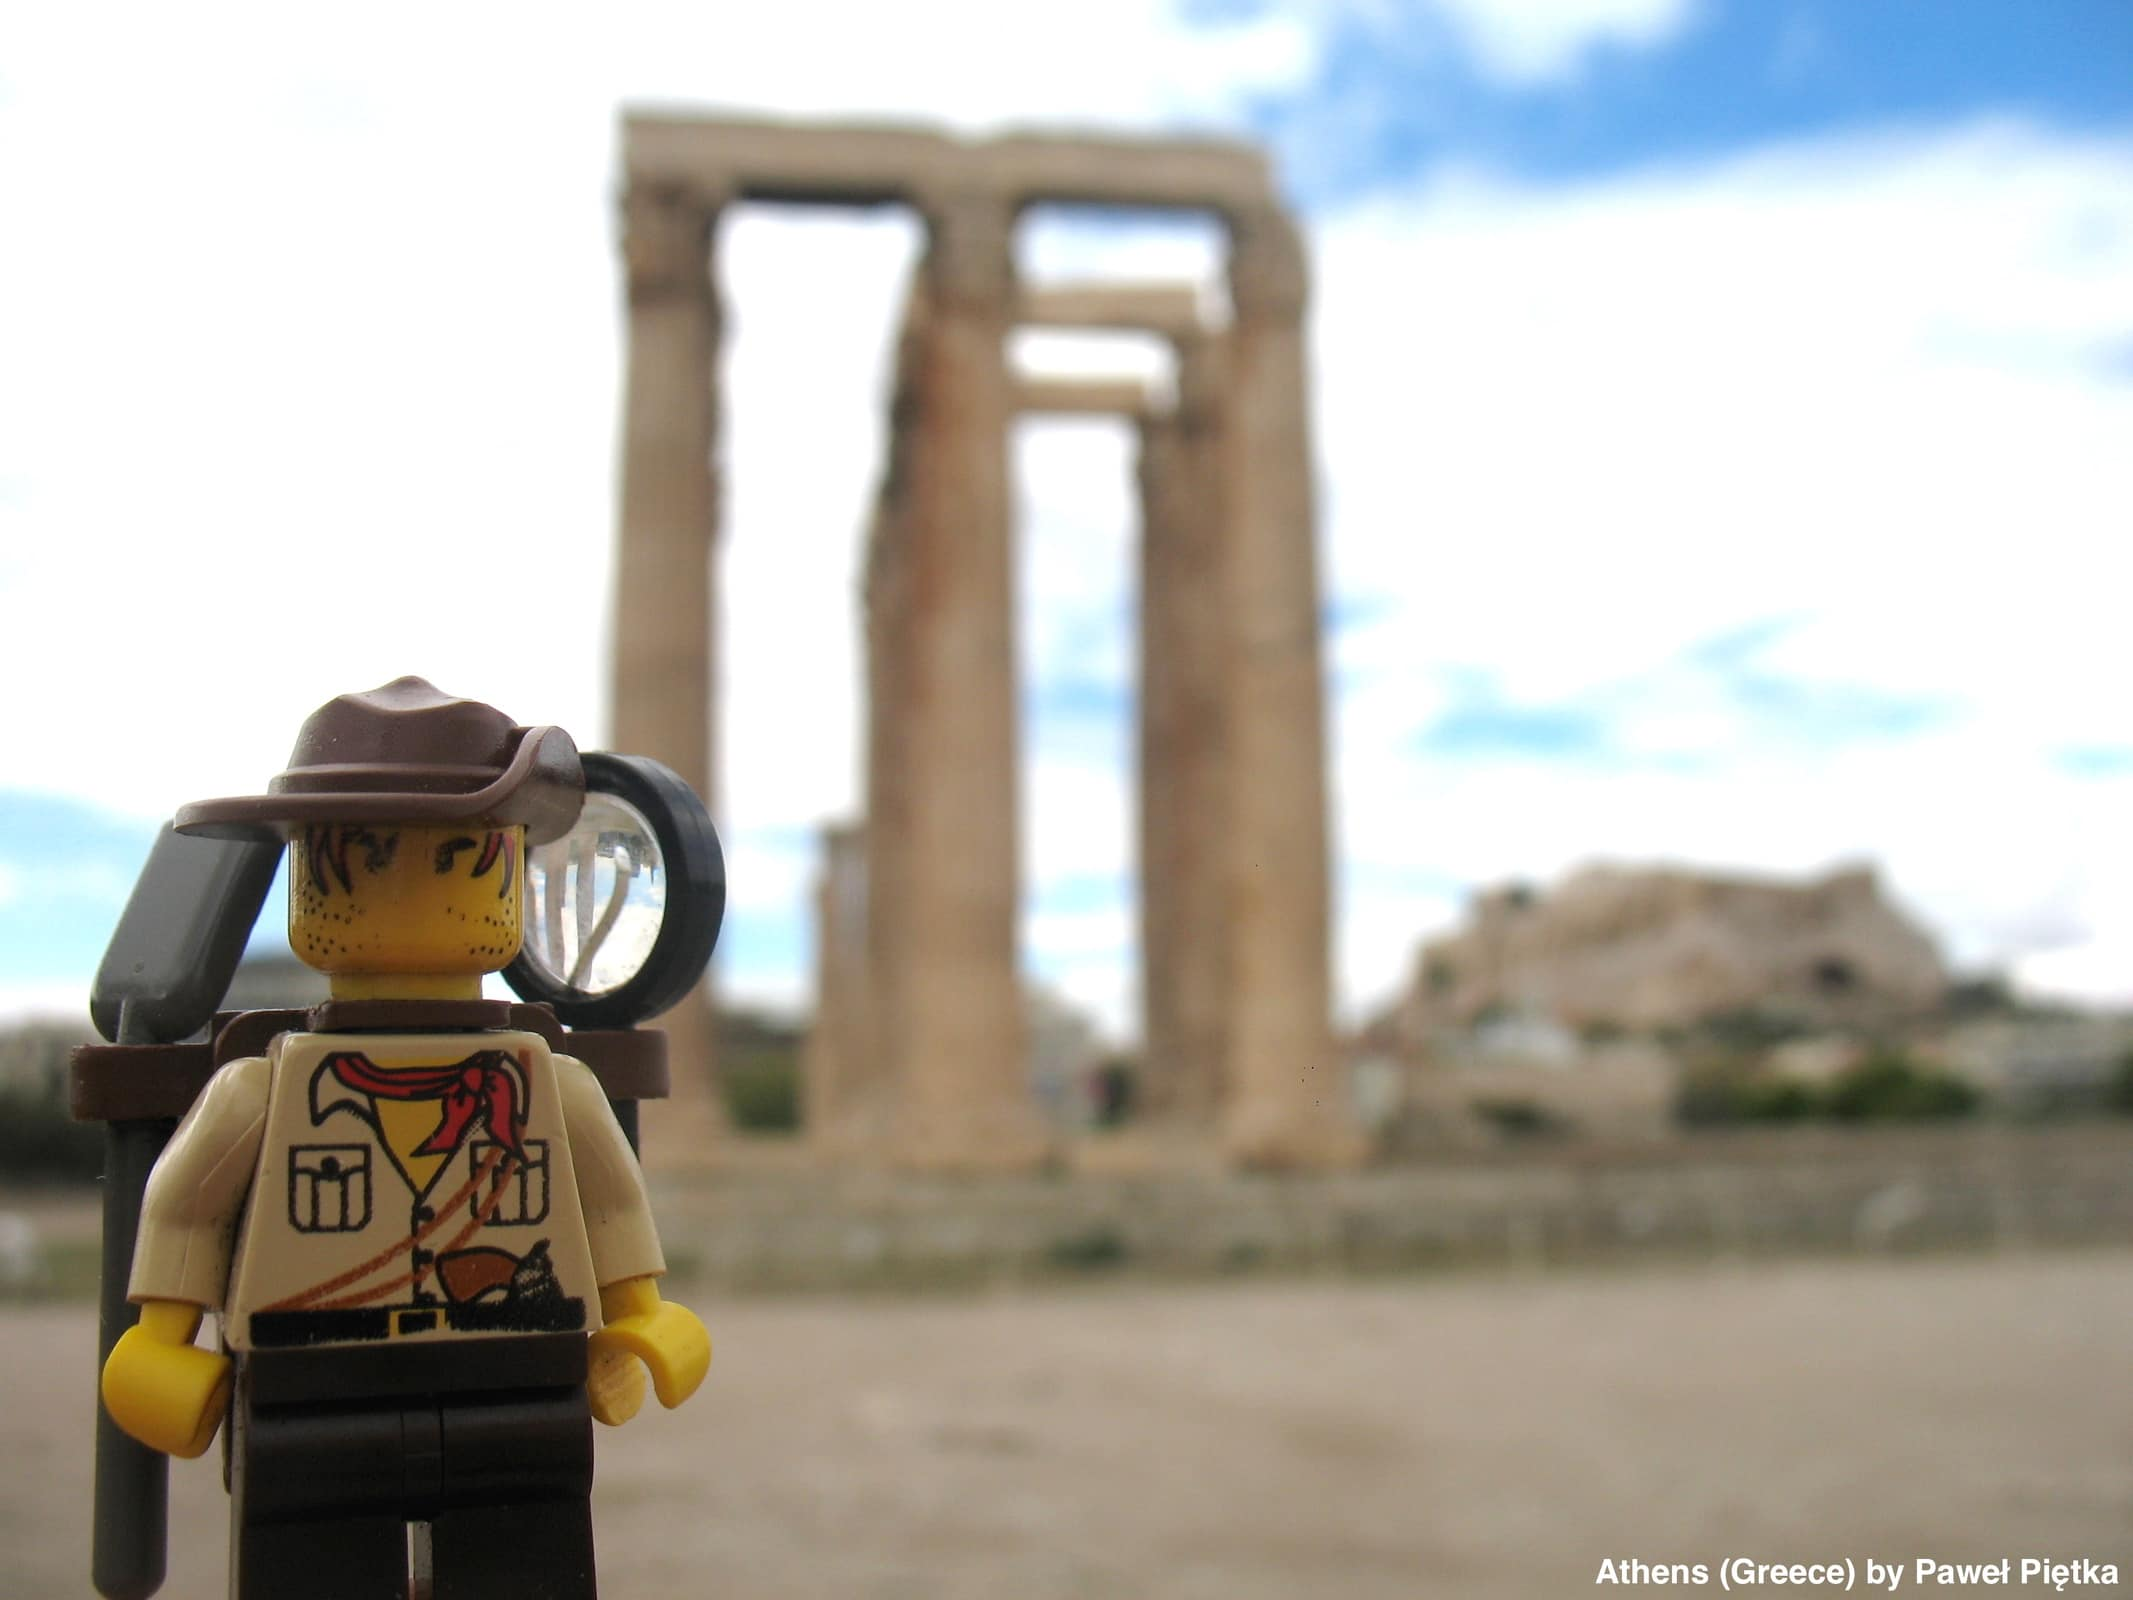 Athens (Greece) - Temple of Olympian Zeus